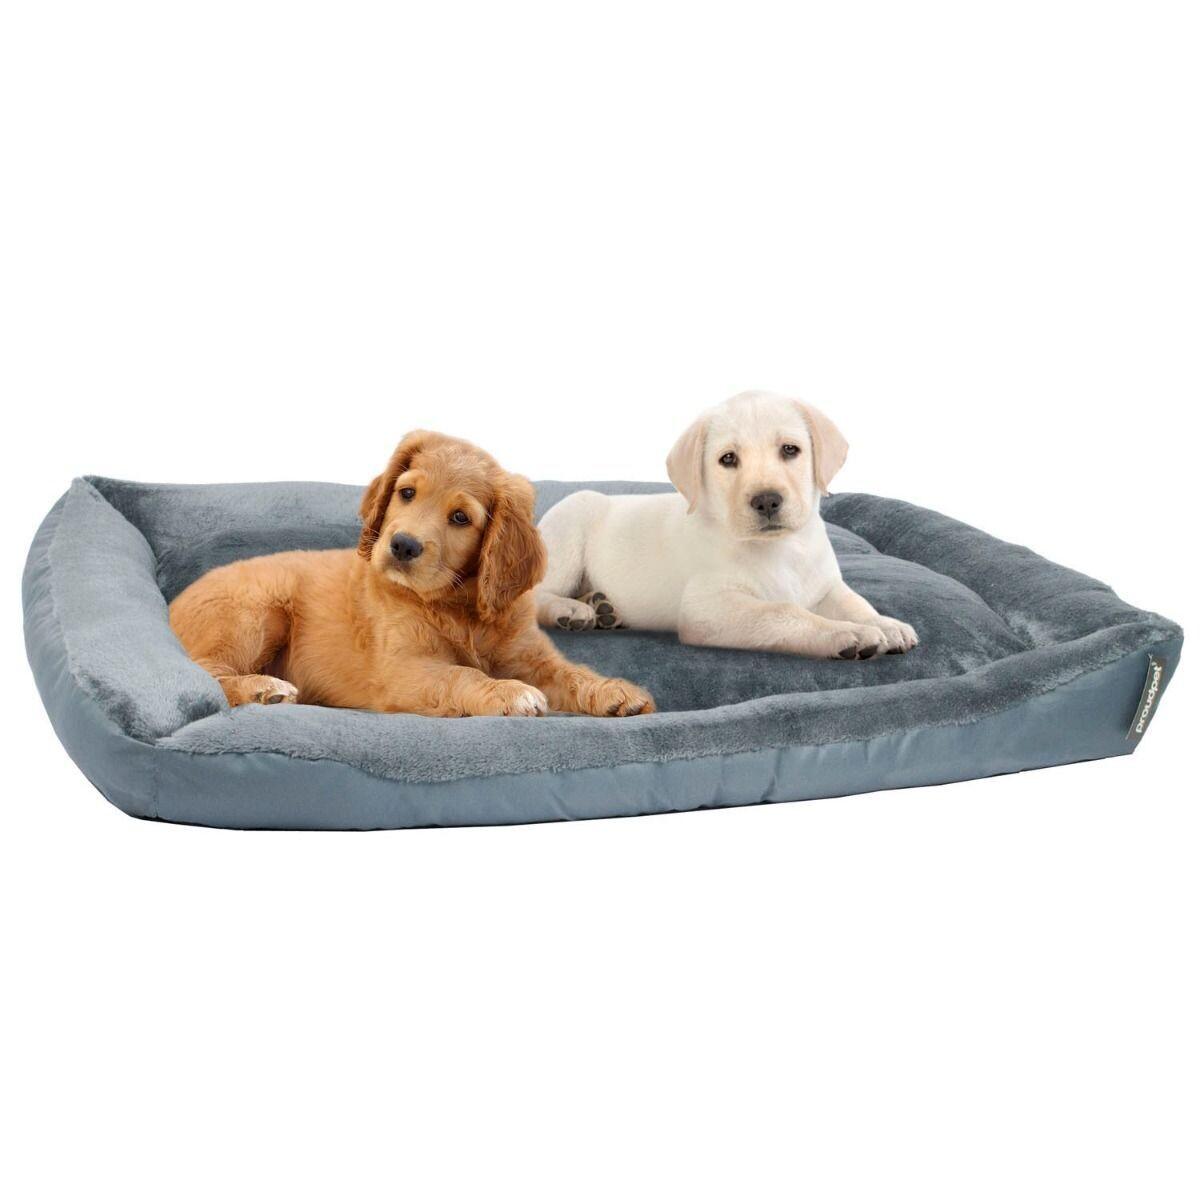 Soft Pet Beds - Ref : (6286)